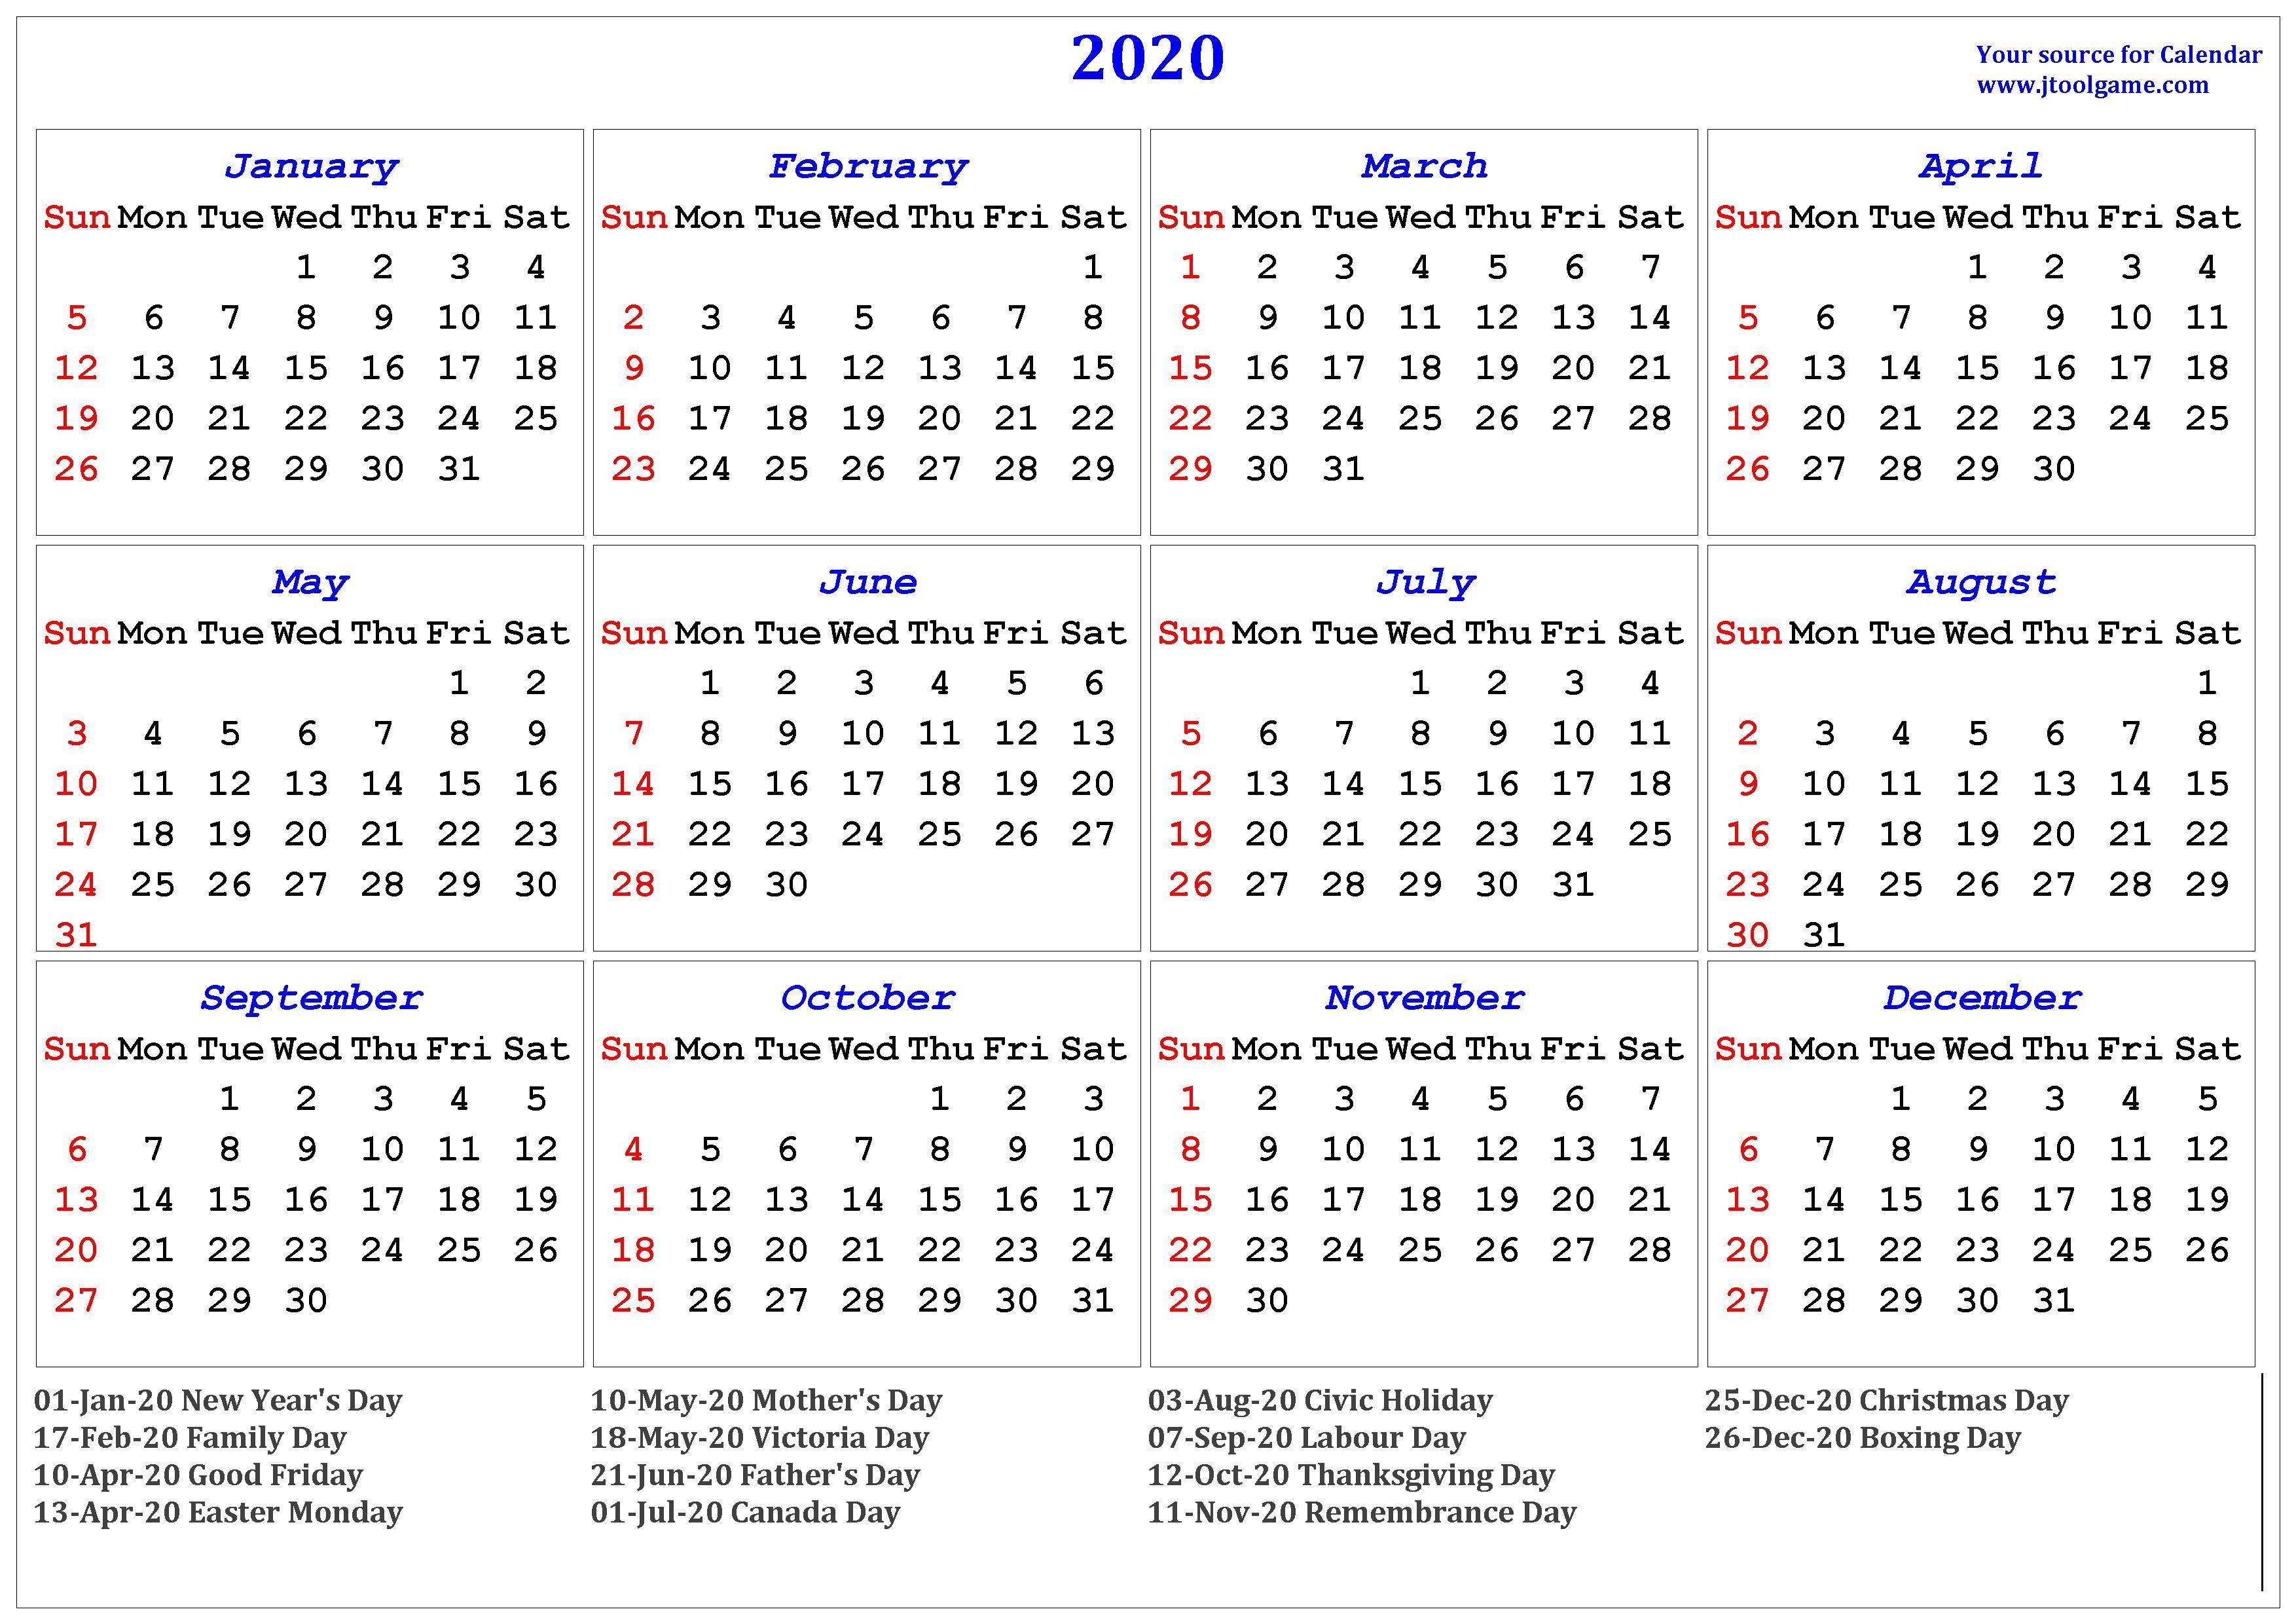 2020 Calendar – Printable Calendar. 2020 Calendar In